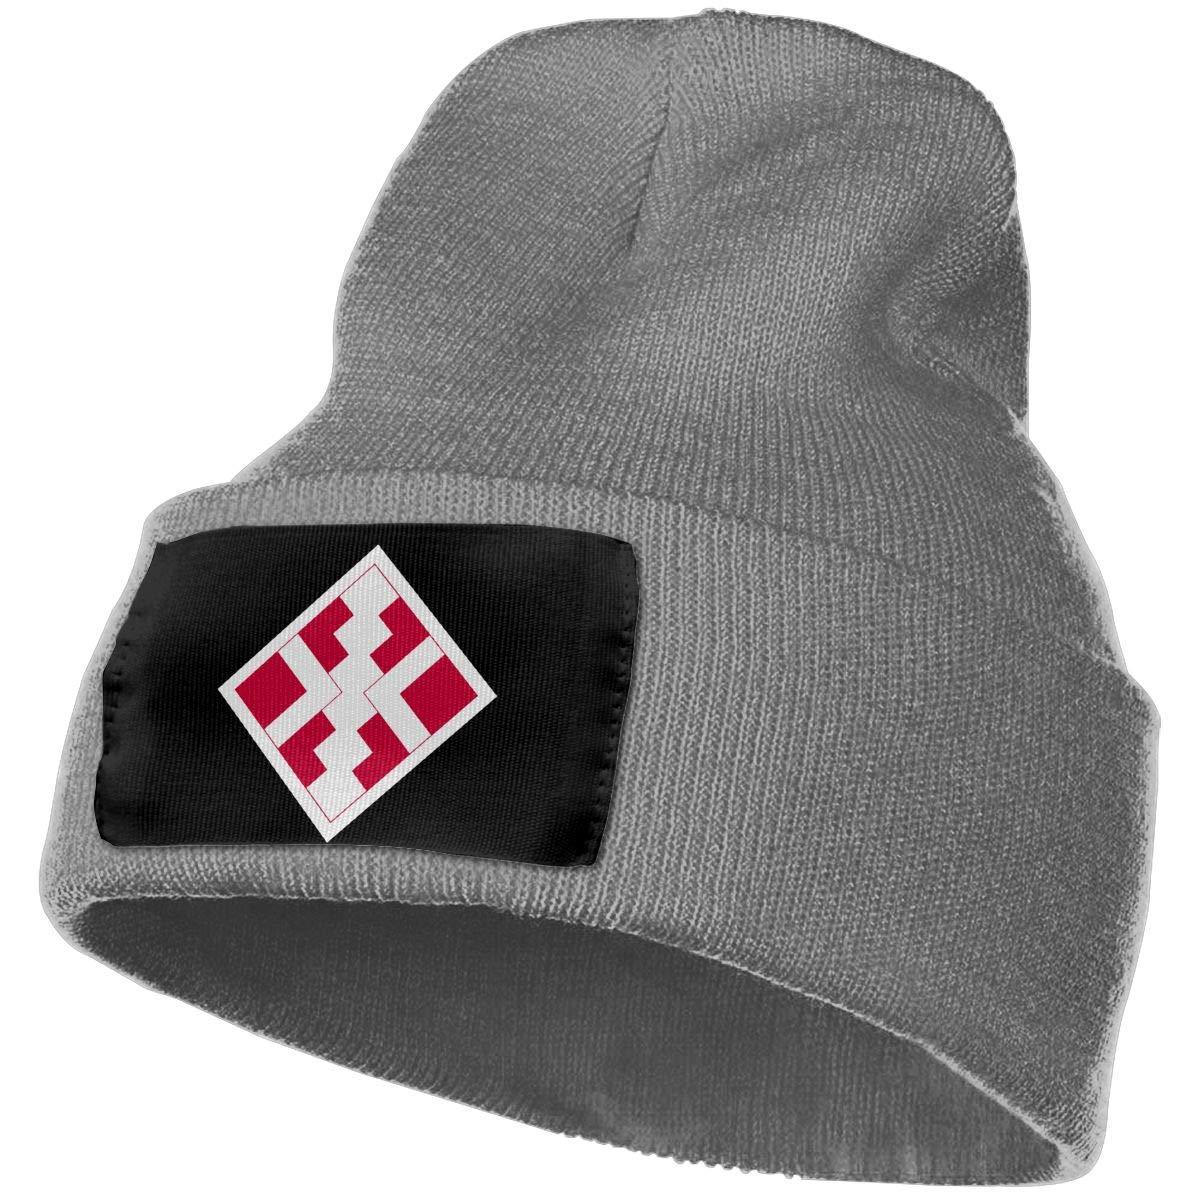 411th Engineer Brigade Men/&Women Warm Winter Knit Plain Beanie Hat Skull Cap Acrylic Knit Cuff Hat